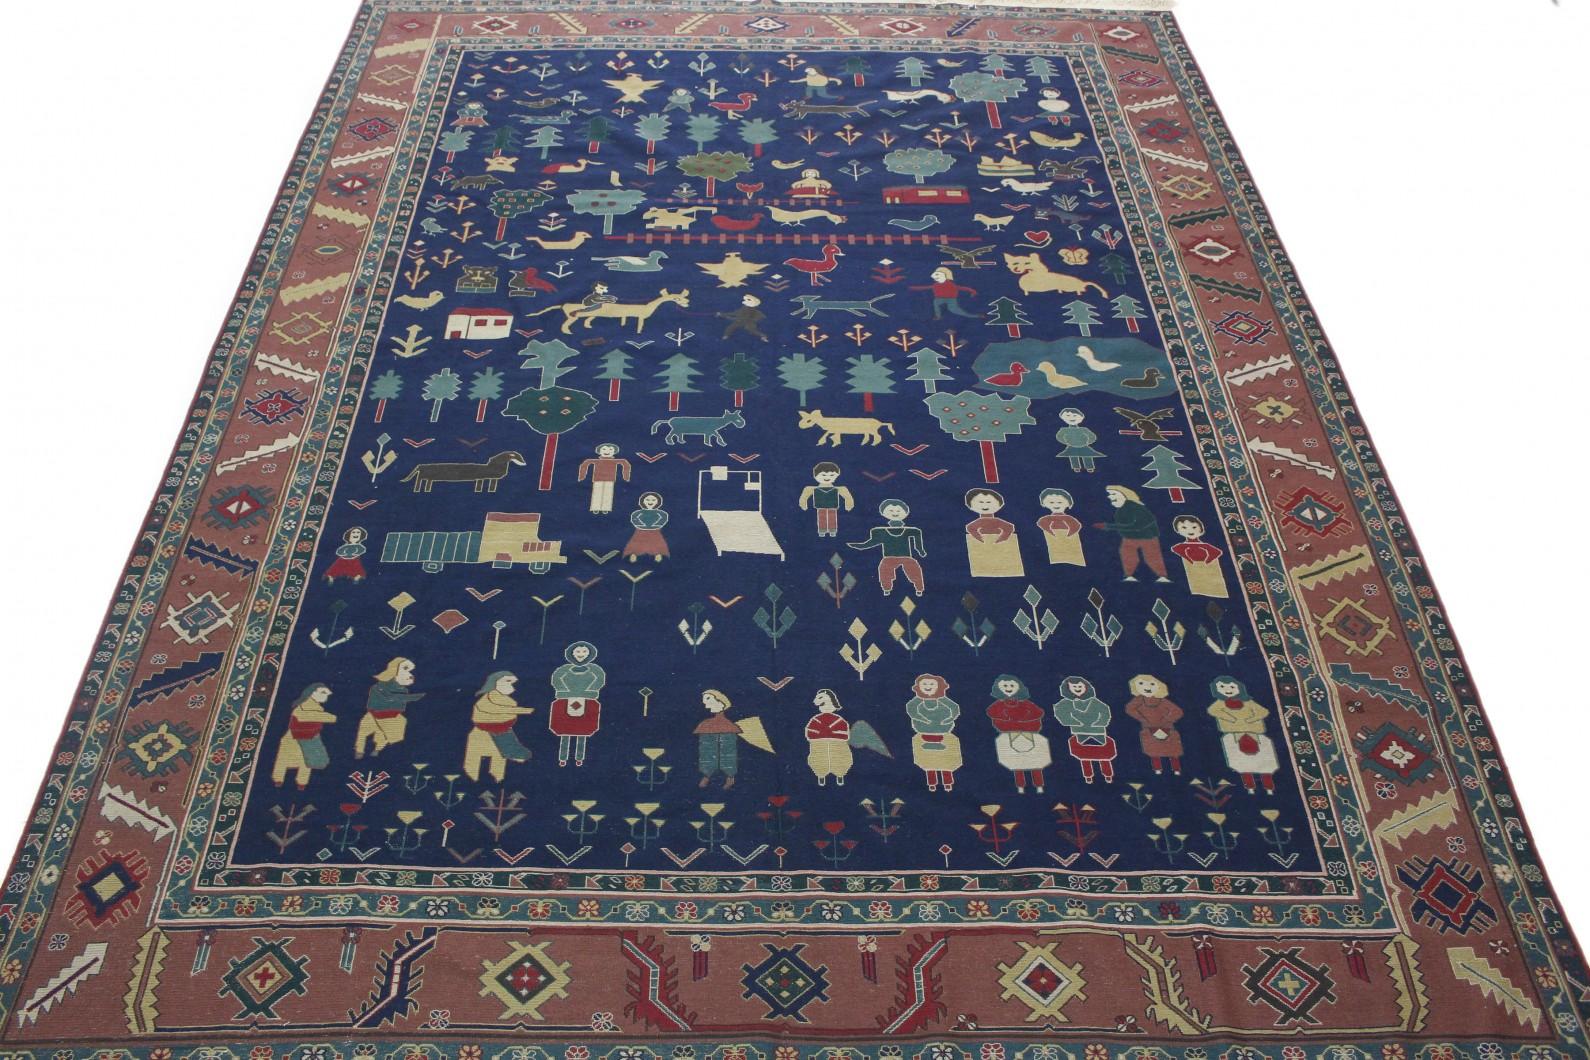 Klassischer Vintage-Teppich Kelim in 360x280 (1 / 8)